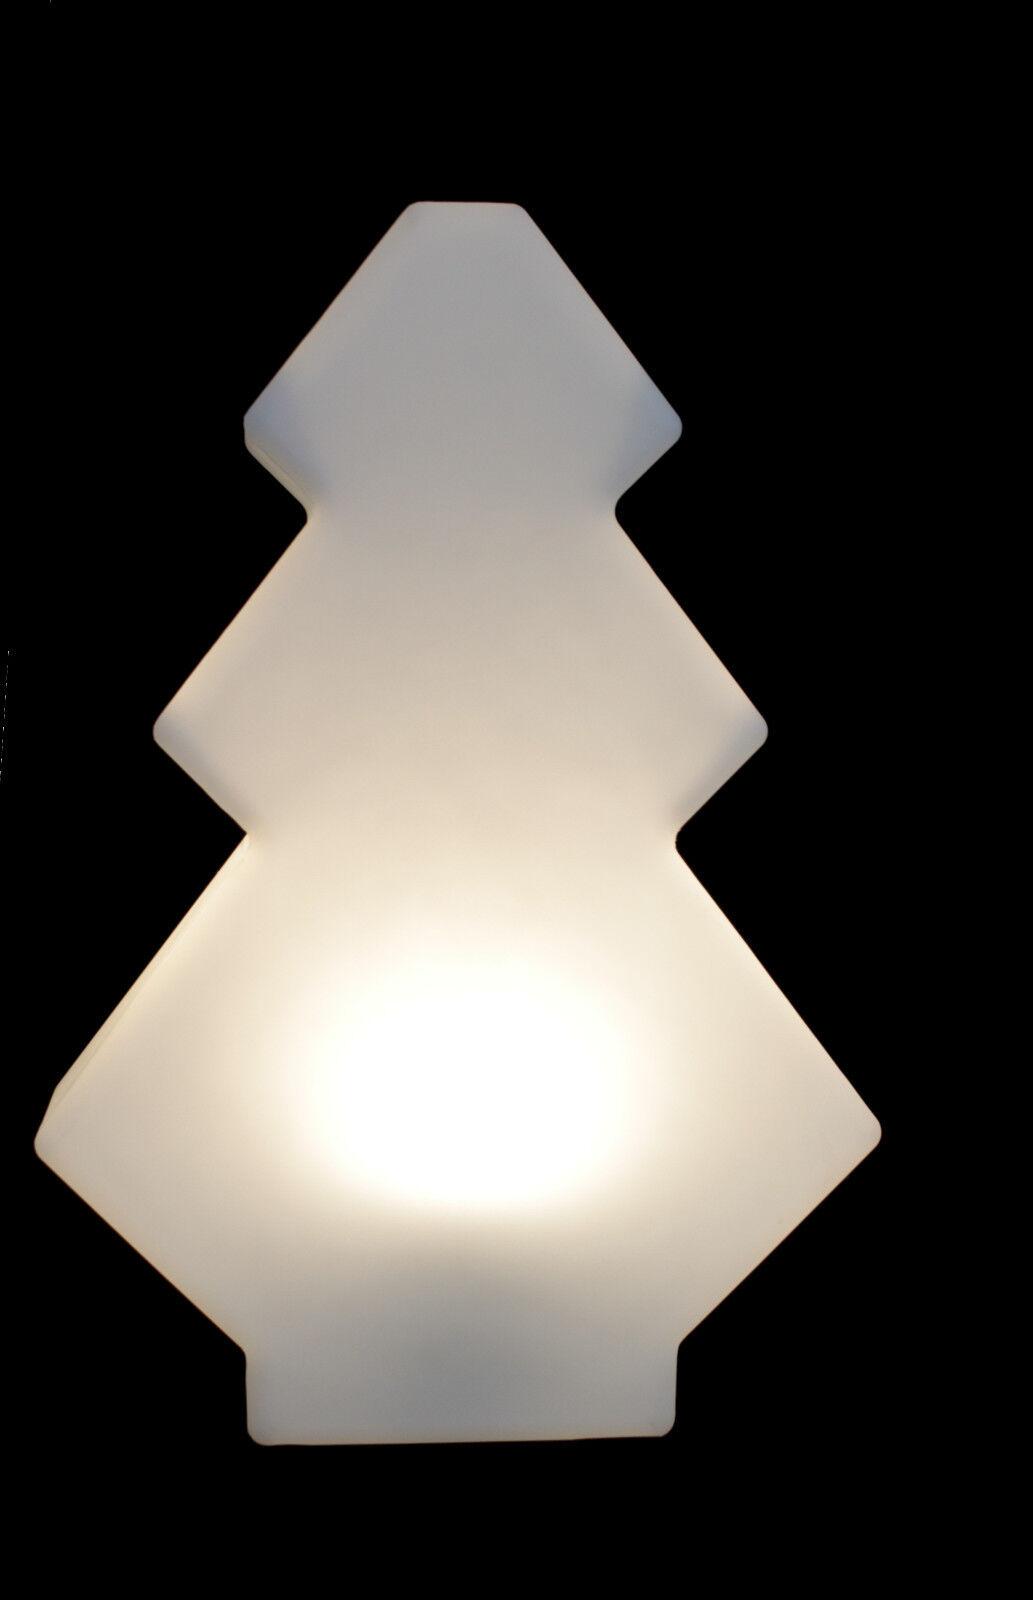 Gartenleuchte Figur Tanne 60cm Weiß inkl. 5m Kabel LED wahlWeiße TG7233